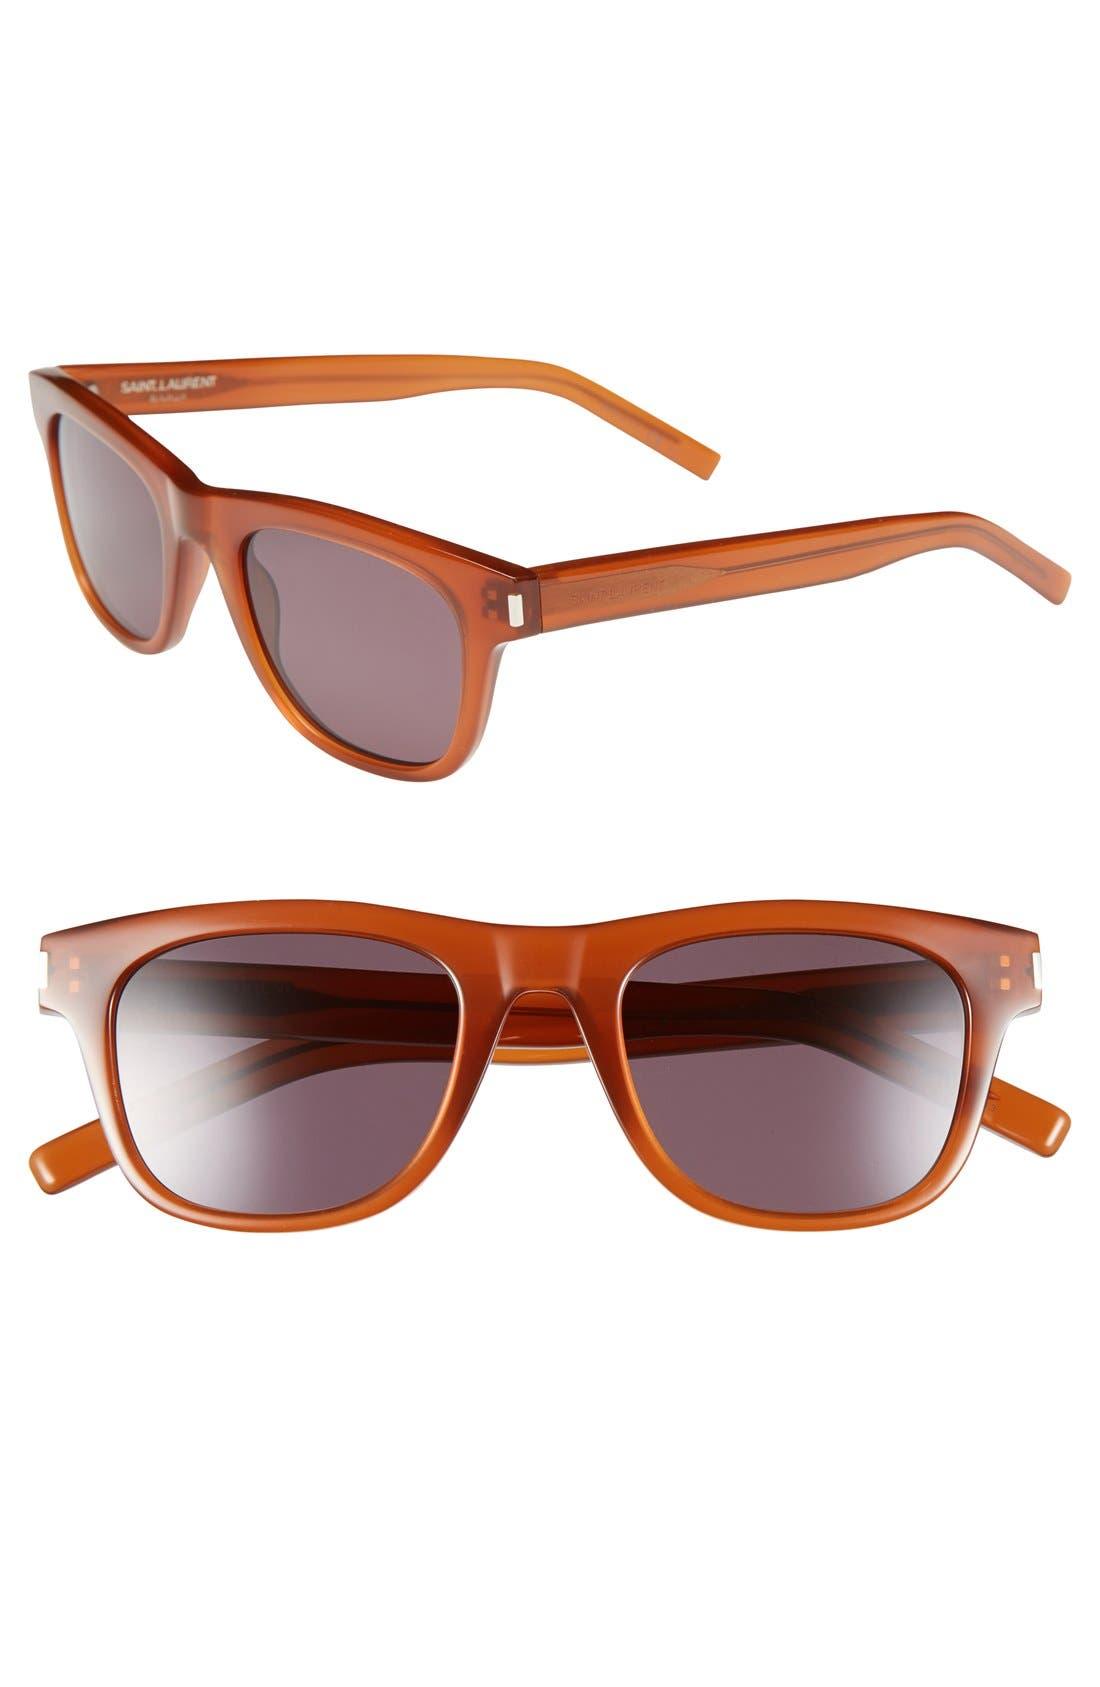 Alternate Image 1 Selected - Saint Laurent 49mm Sunglasses